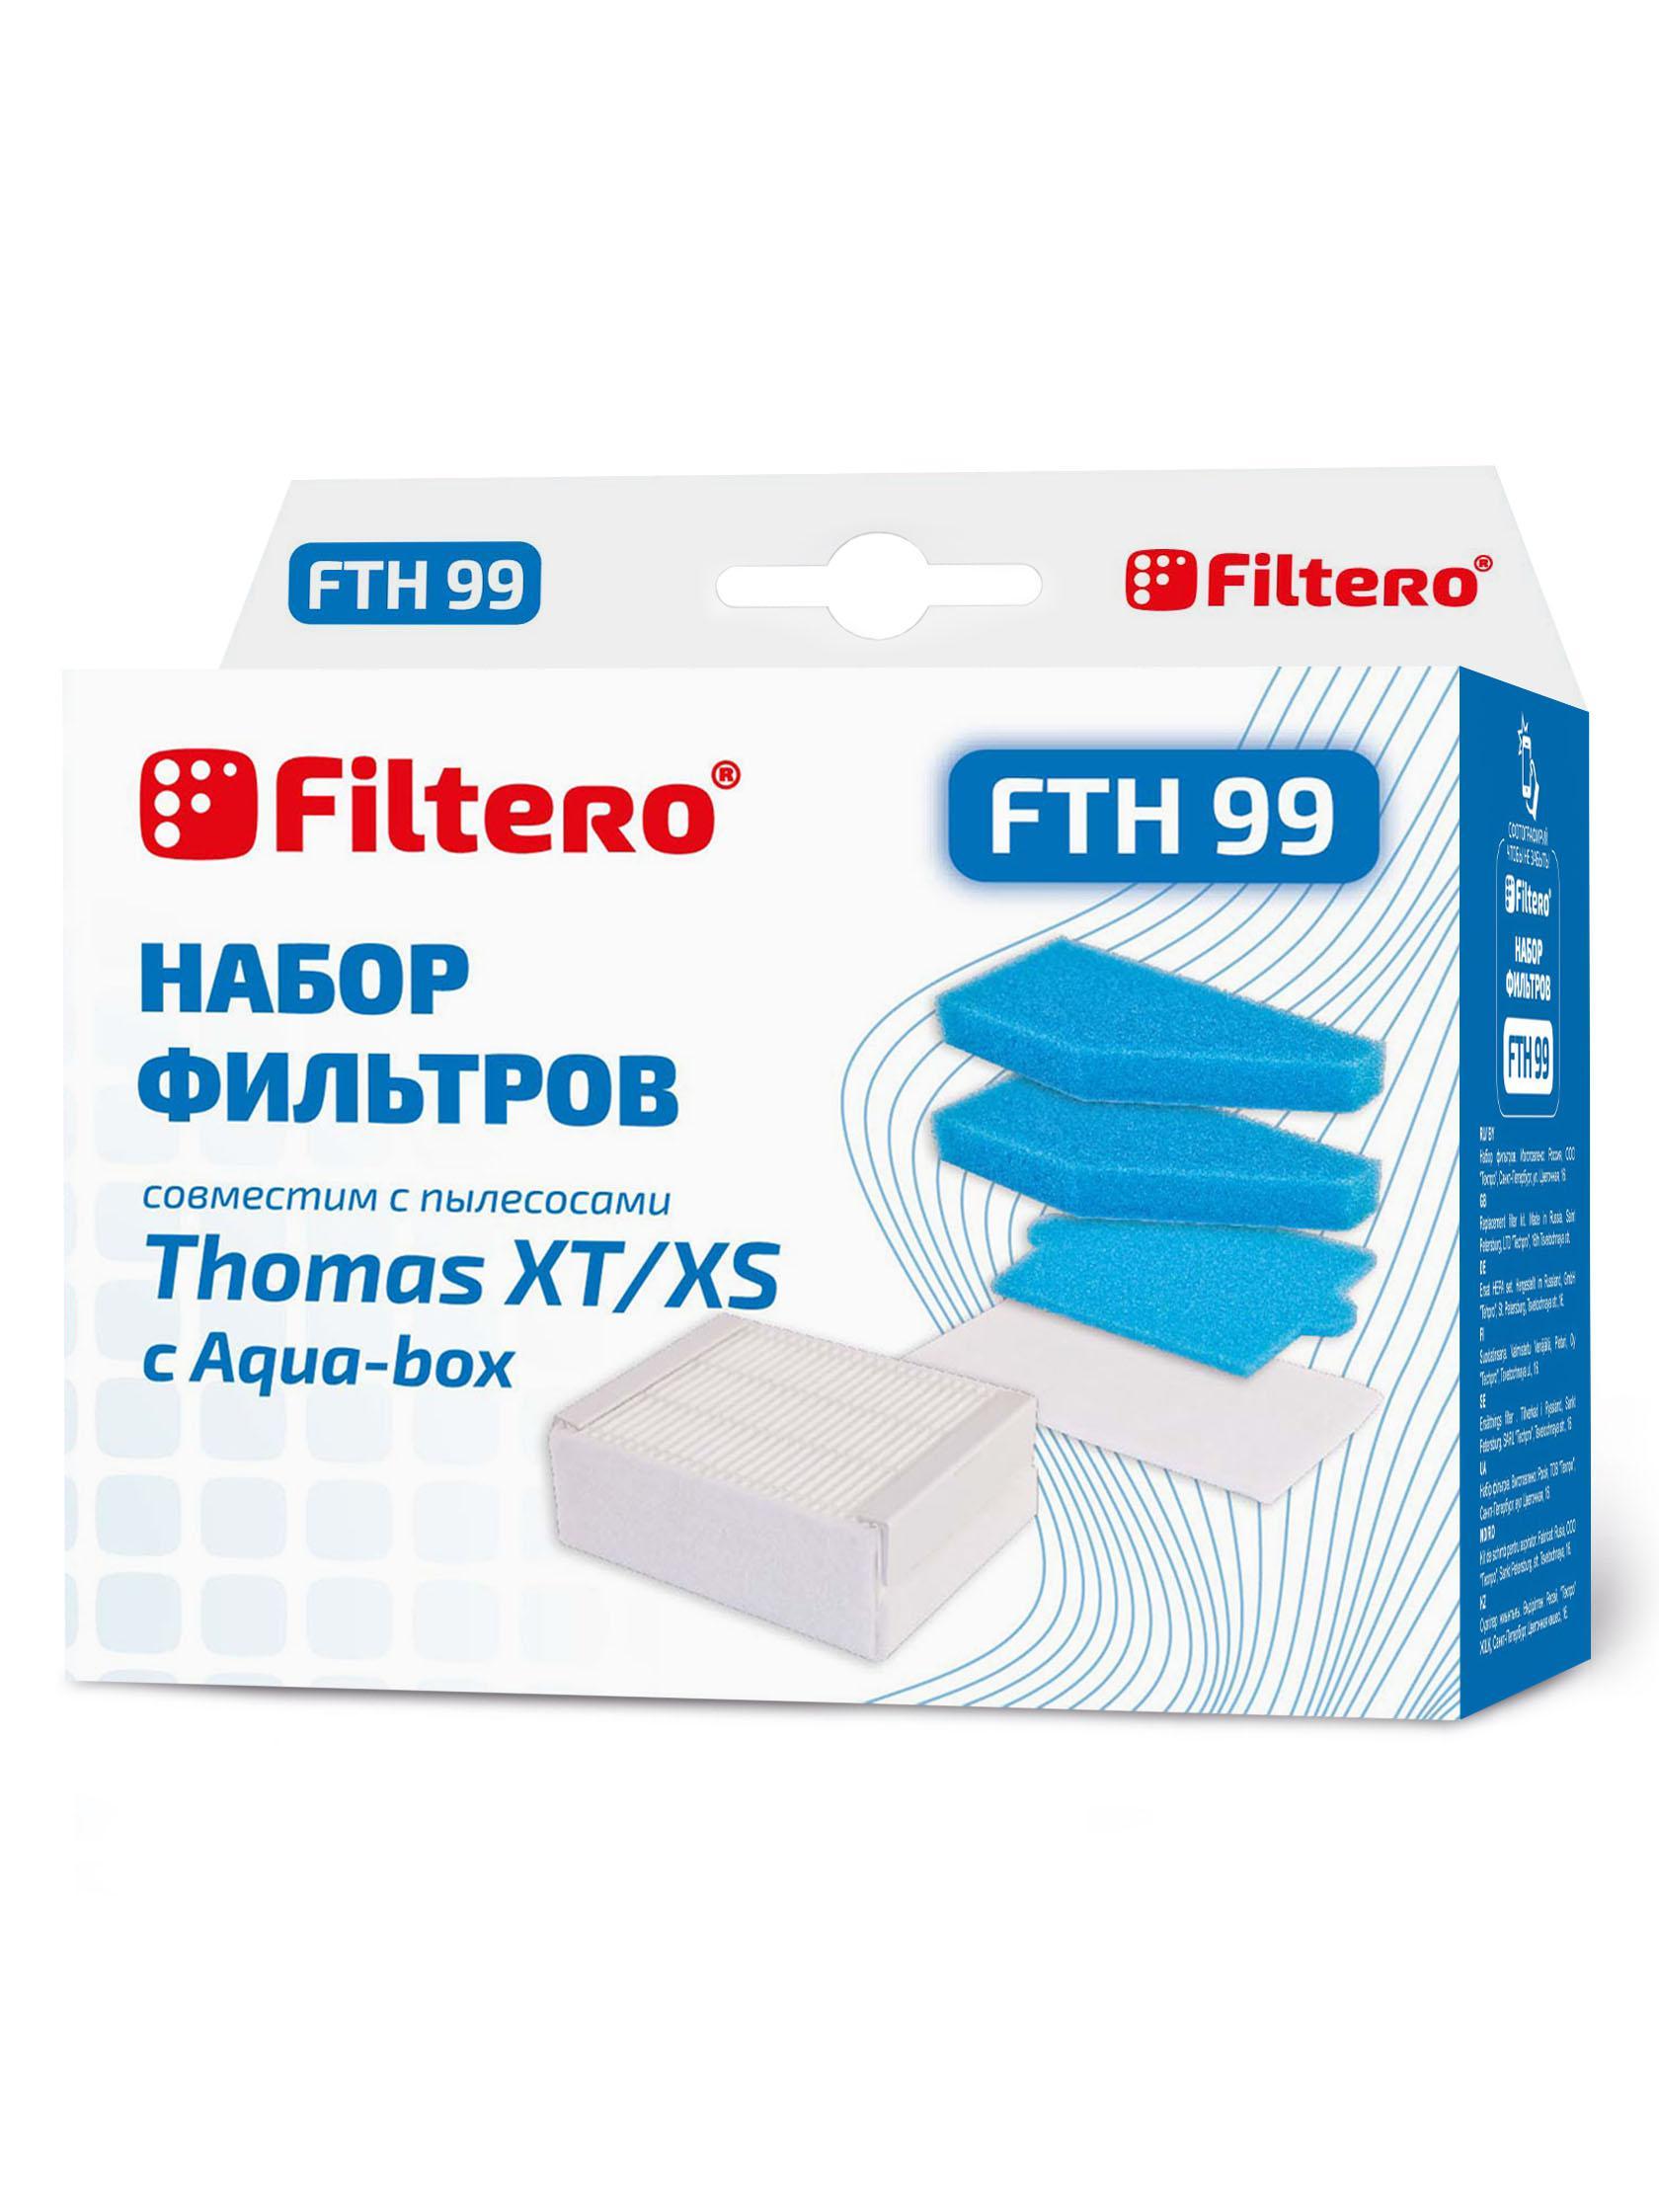 Фильтр Filtero Fth 99 tms hepa